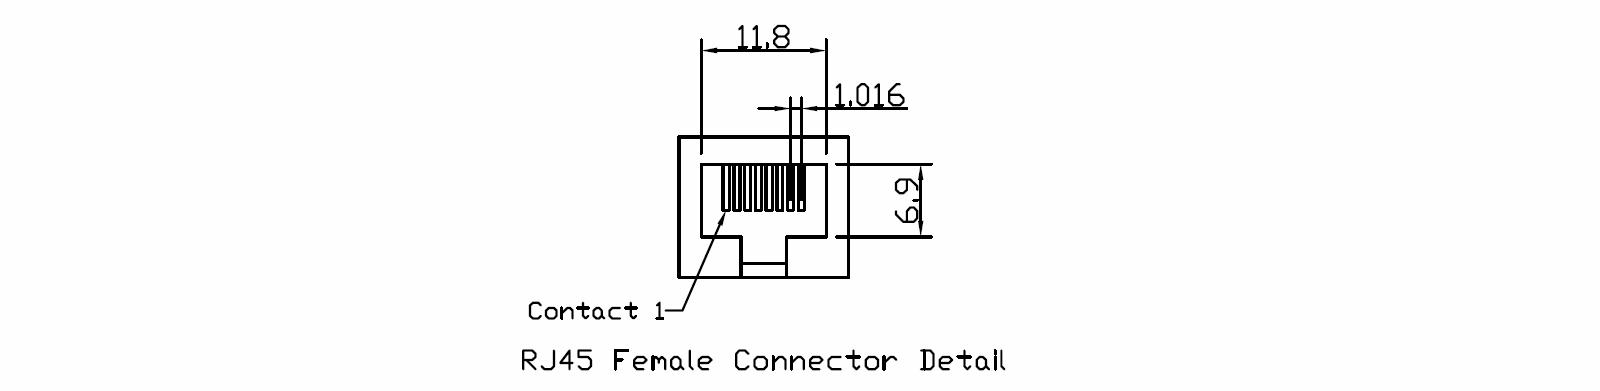 RJ45 Female Connector